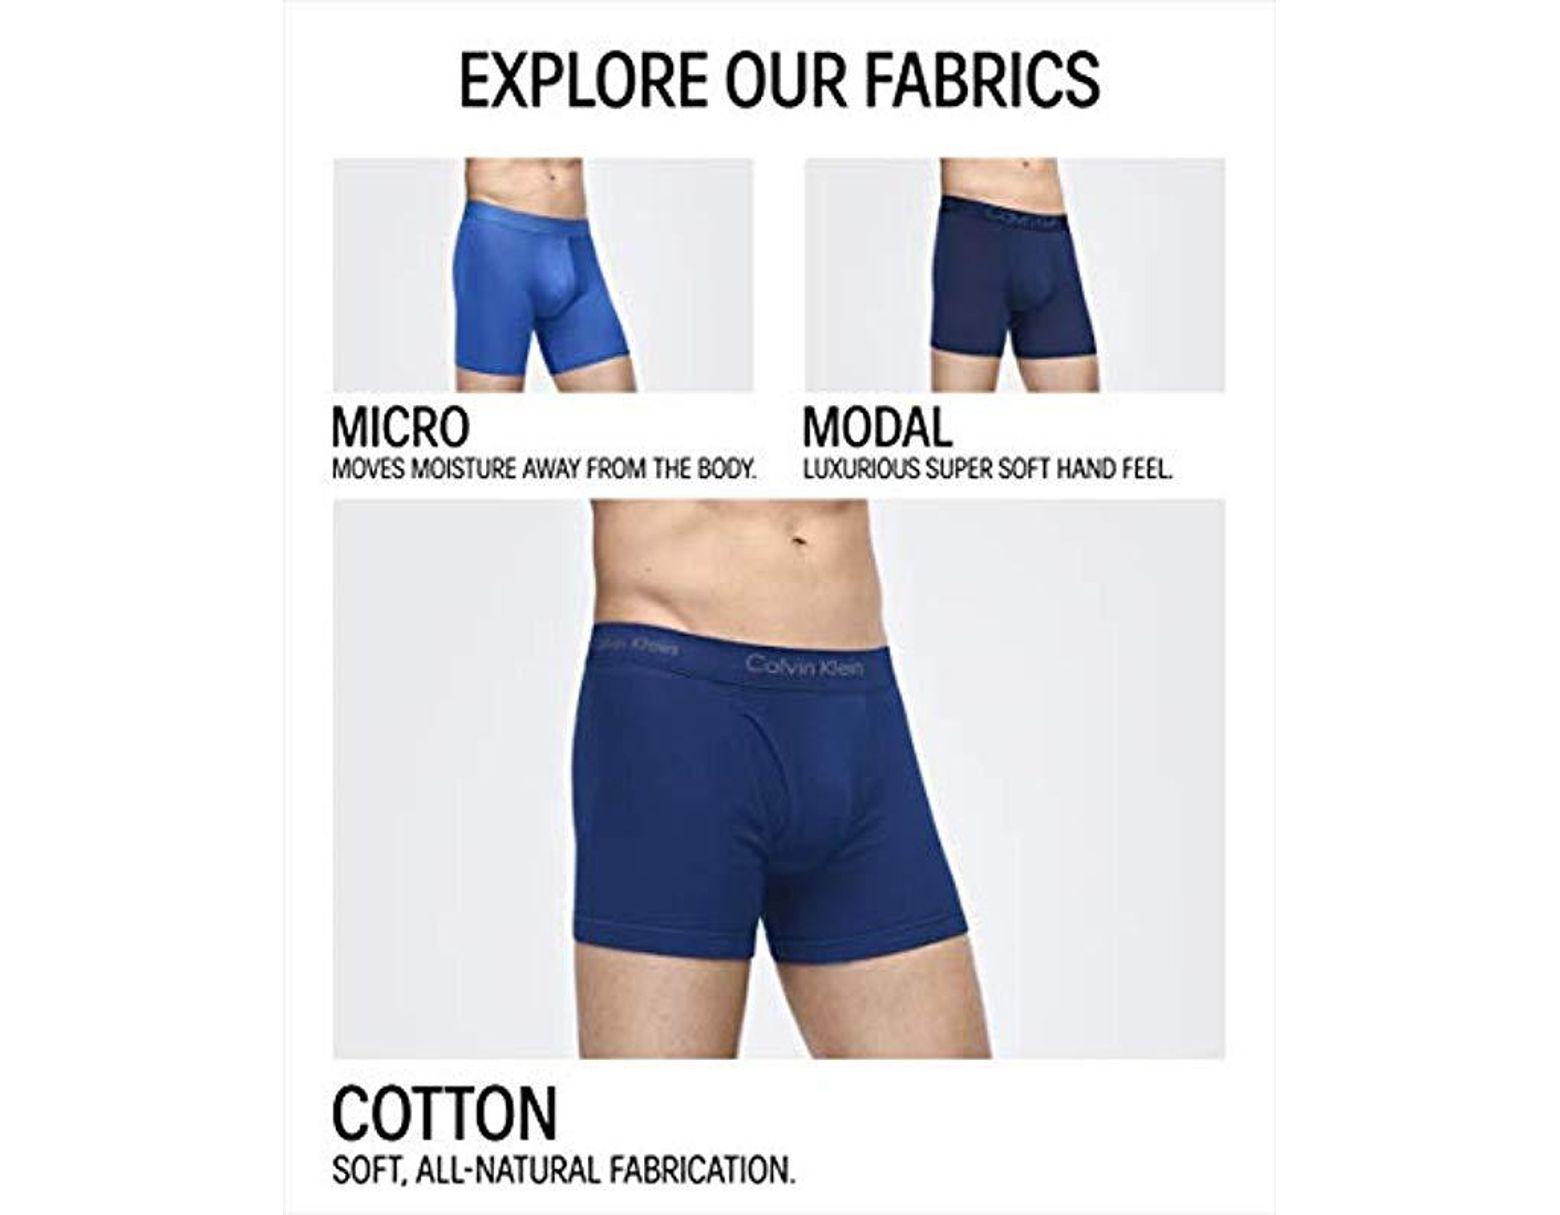 e74a81c9062c Calvin Klein The Pride Edit 5-pack Jock Strap for Men - Lyst